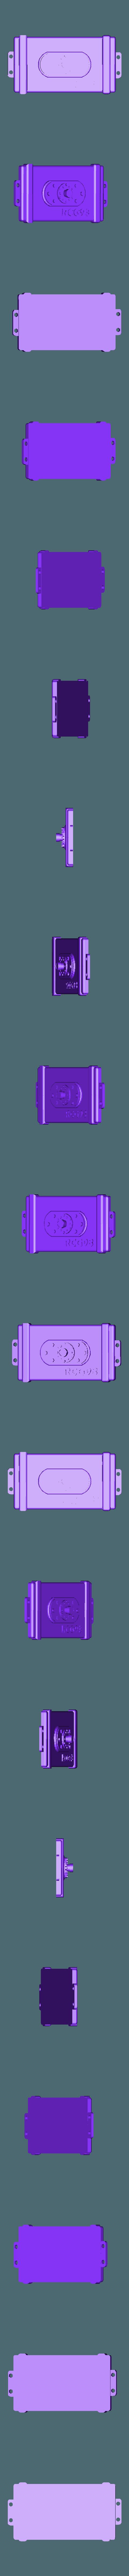 RESERVOIR couv.stl Download free STL file tank rc 1/10 electro box • 3D printable model, RCGANG93